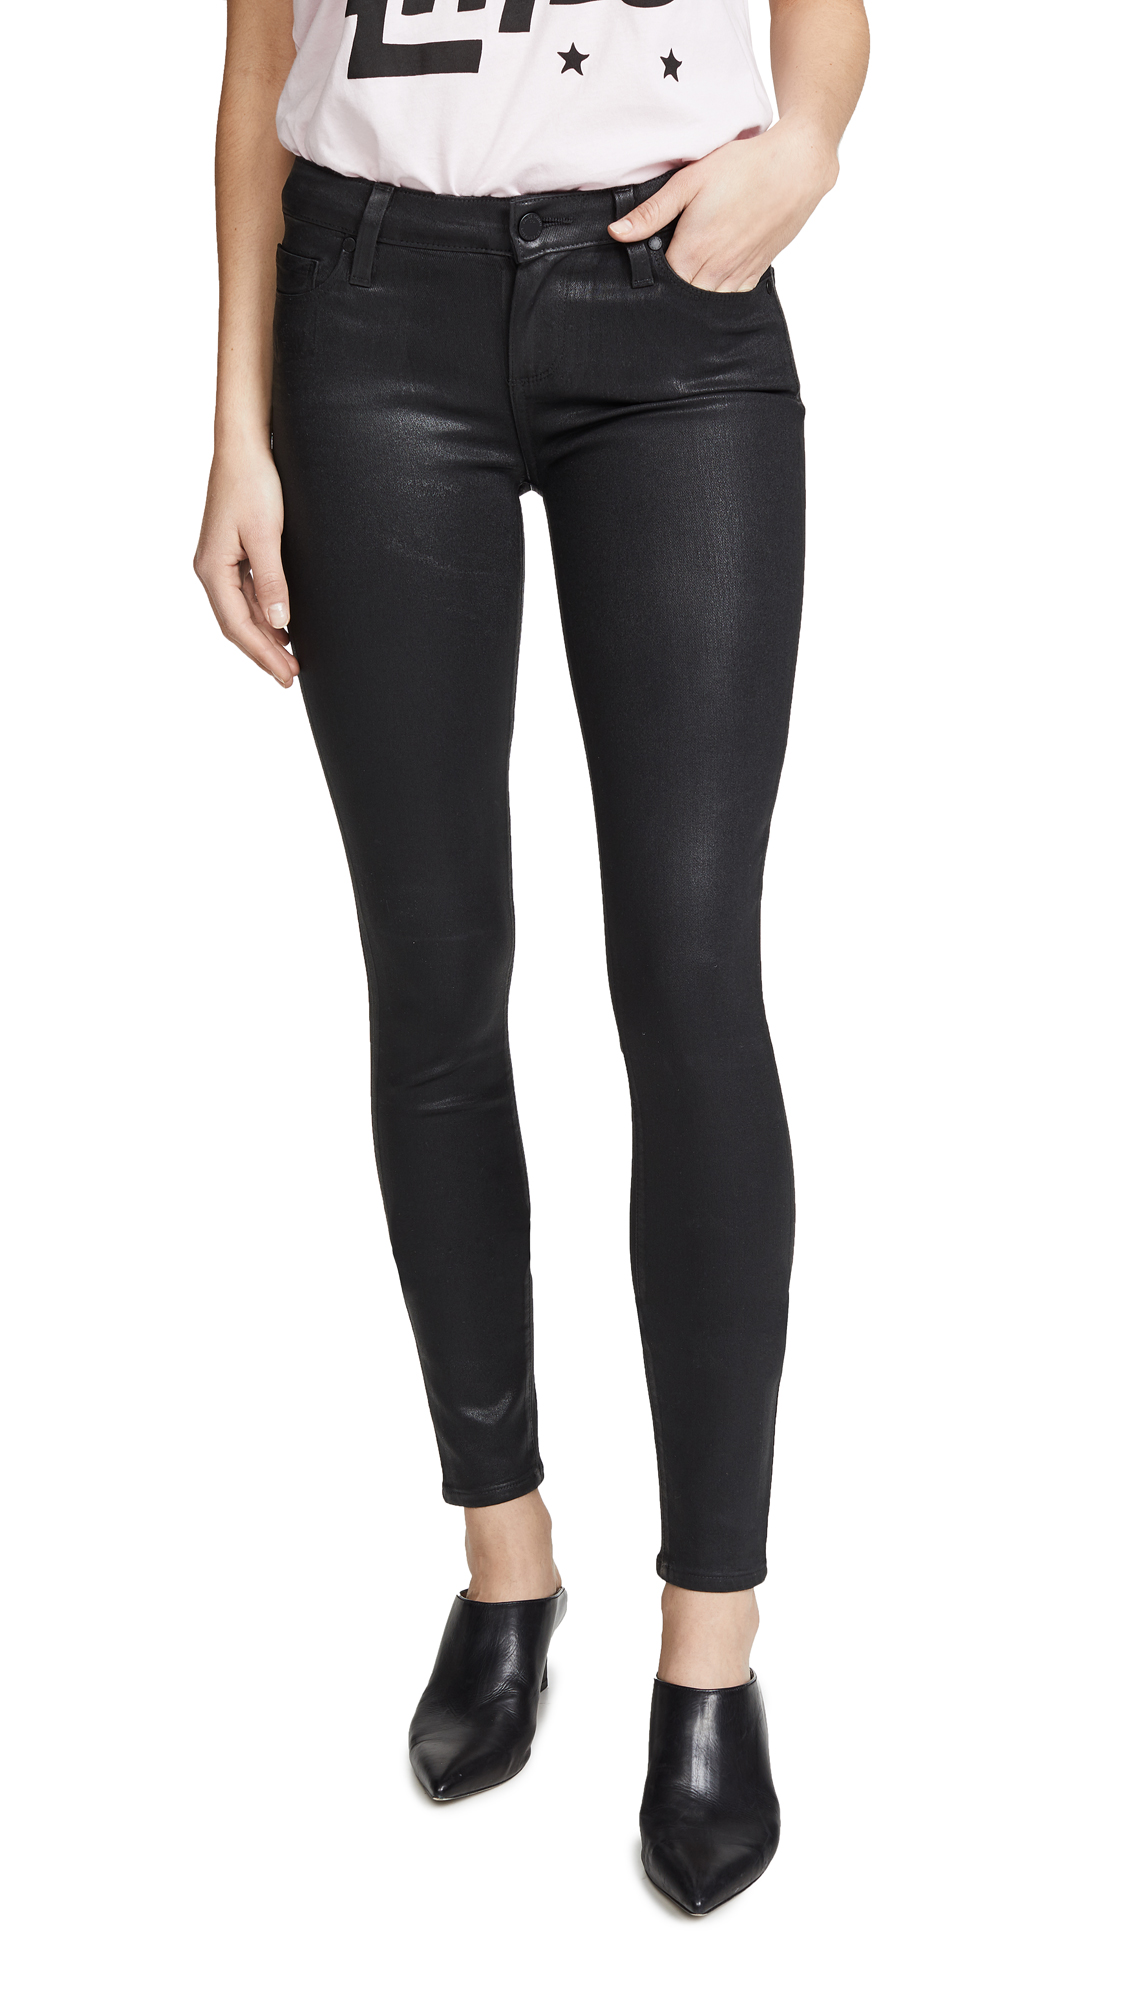 PAIGE Verdugo Ultra Skinny Jeans - Black Fog